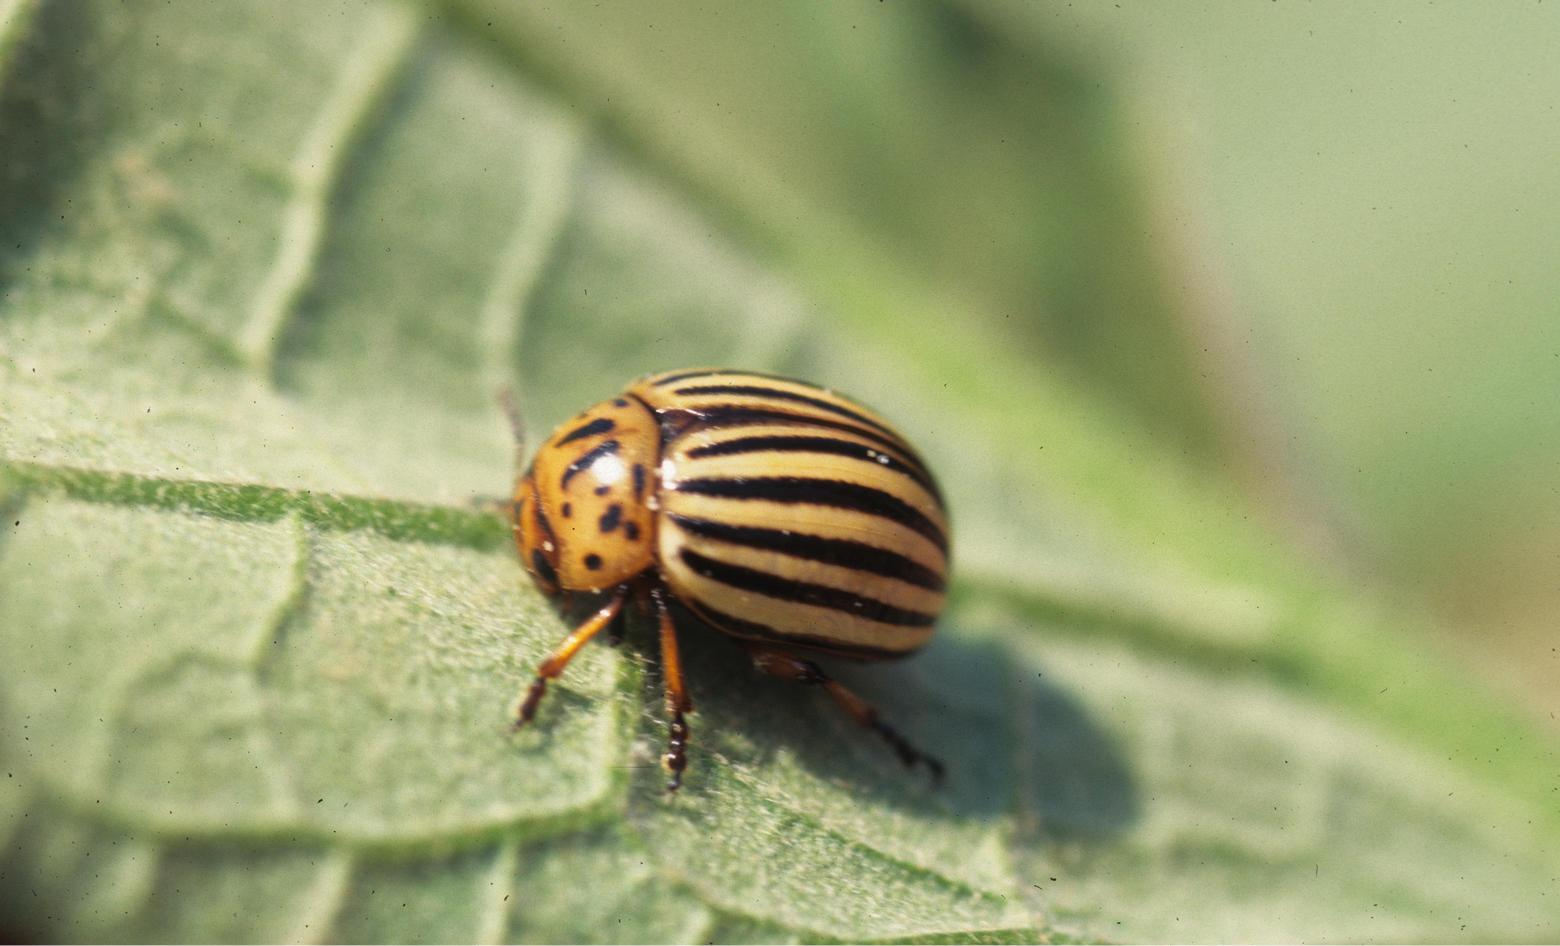 Adult_beetle.jpg